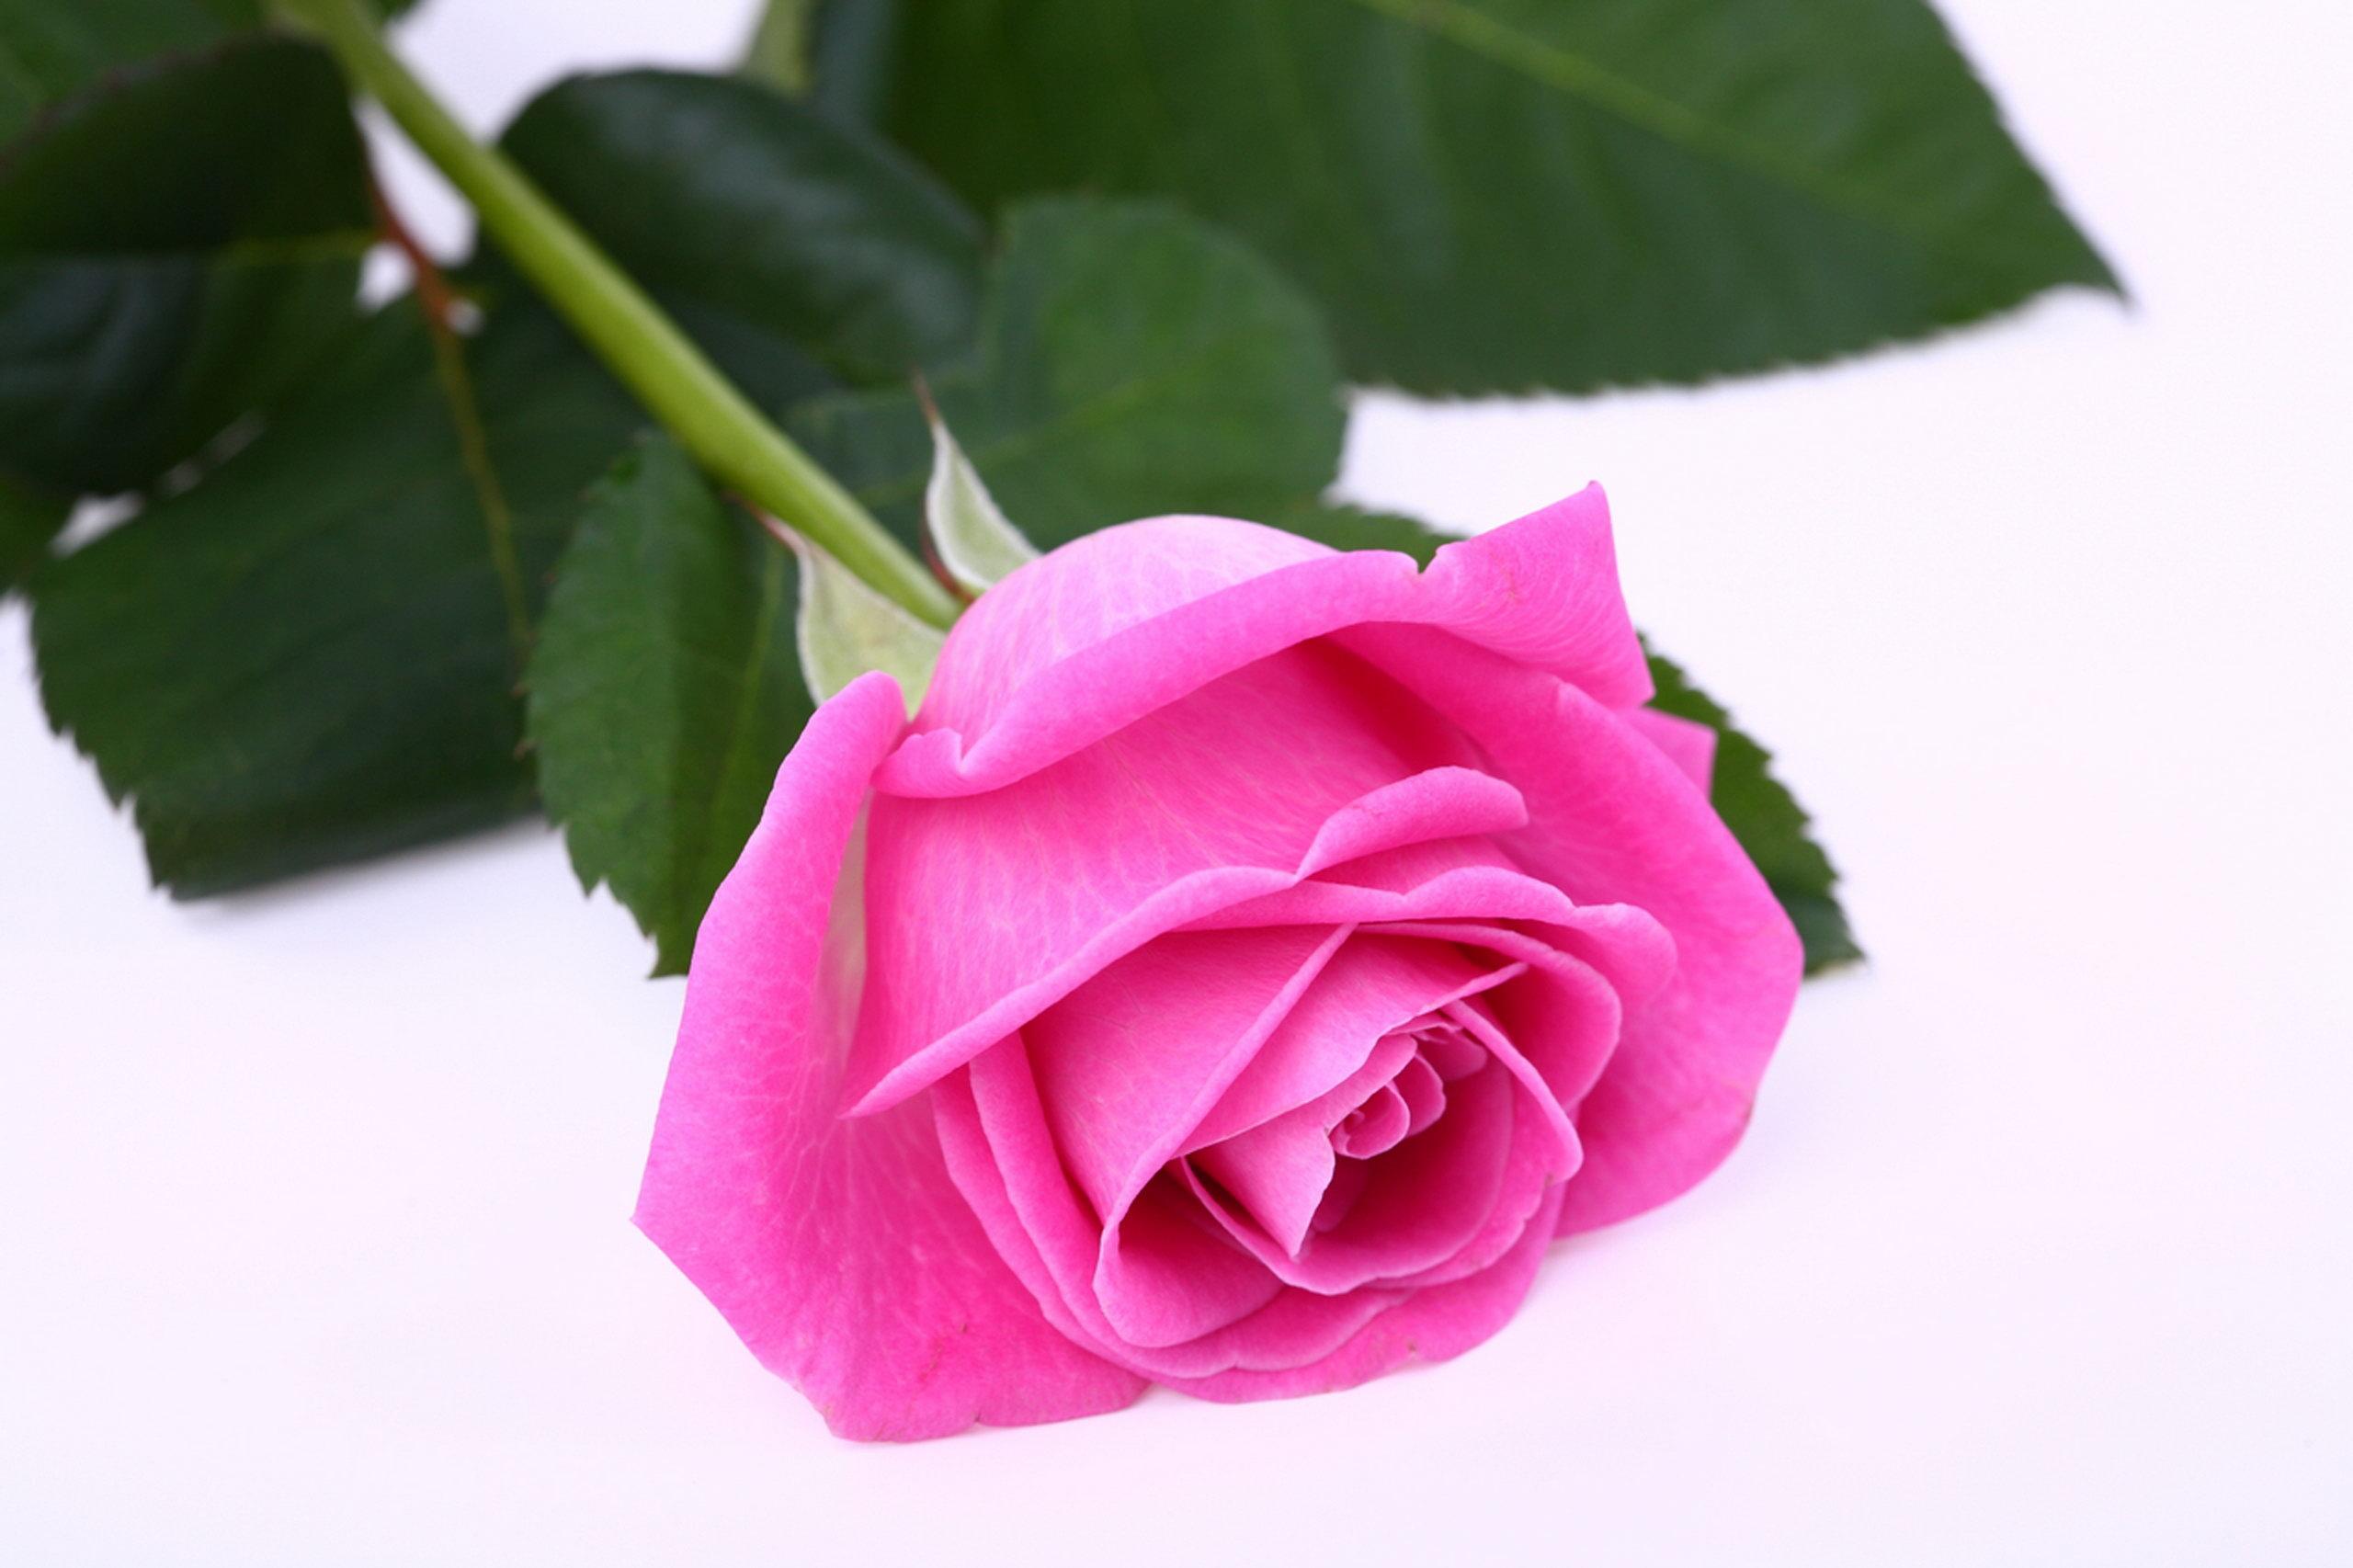 Pink Rose Wallpapers Hd Beautiful Rose Photo Download 2560x1706 Wallpaper Teahub Io